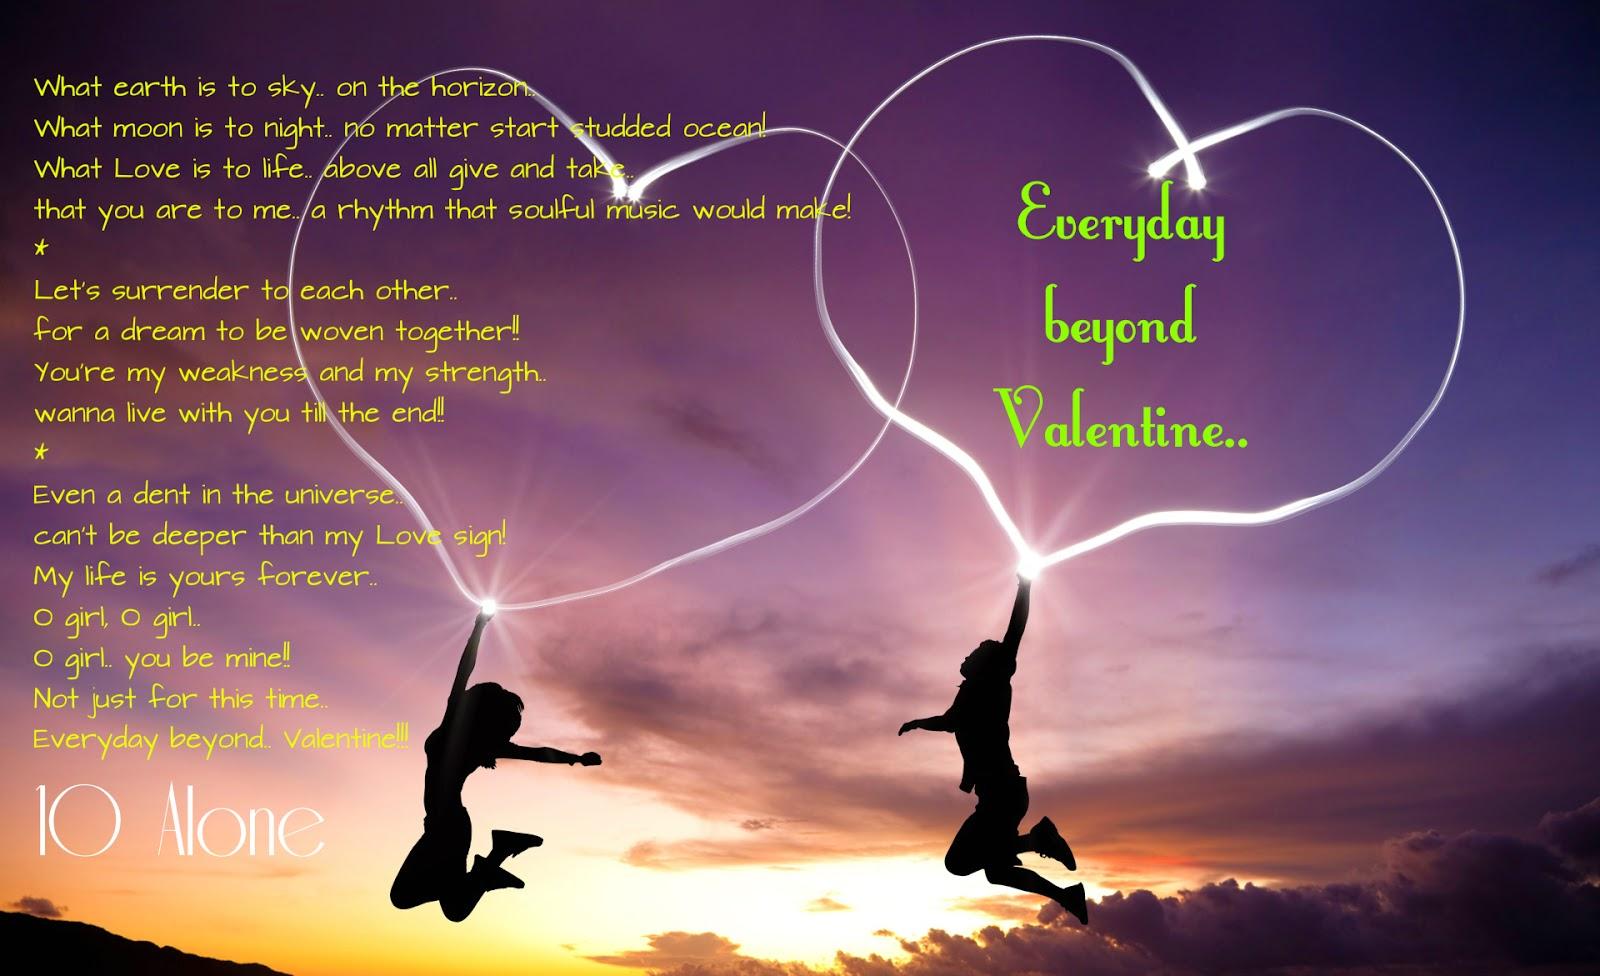 Everyday-beyond-Valentine--Lovely-VDay-Week-Poem-14Feb-Day-Rose-Propose-Chocolate-Teddy-Promise-Hug-Kiss-Vikrmn-10alone-ca-vikram-verma-chartered-accountant